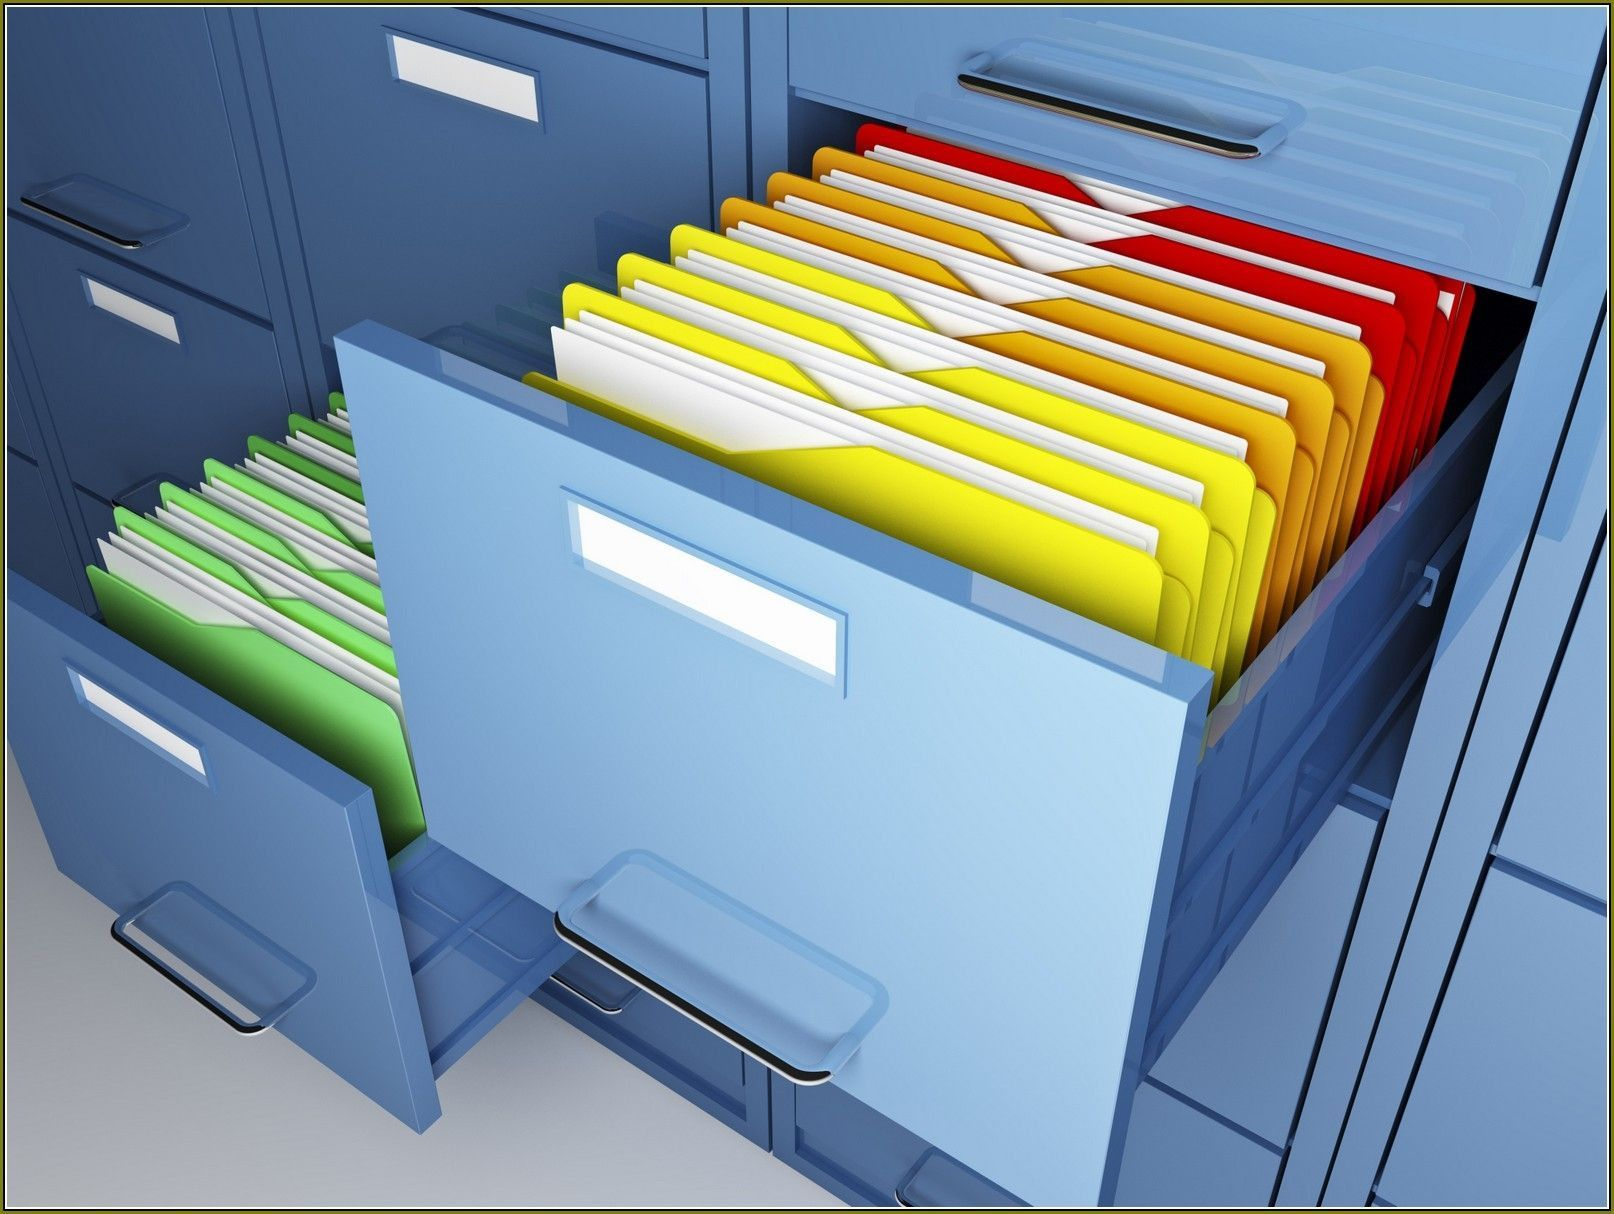 file filingcabinets product hangers drawer category filing uganda rwanda kenya cabinets cabinet